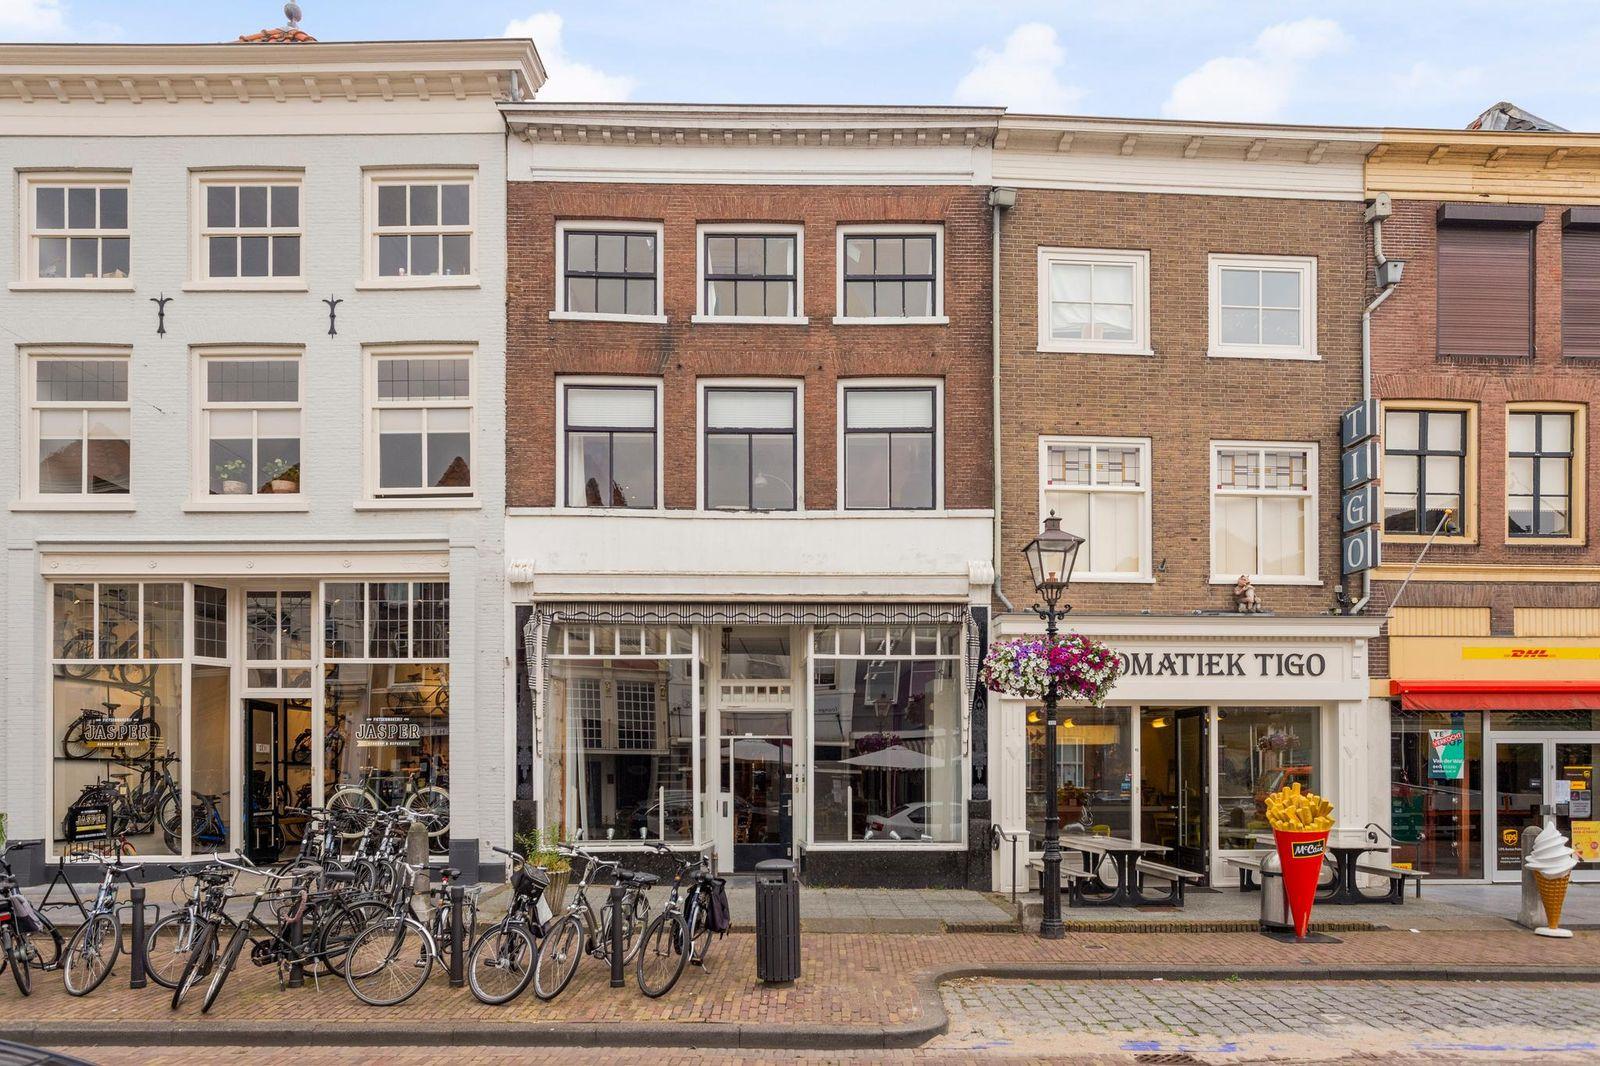 Waterstraat 13, Zaltbommel